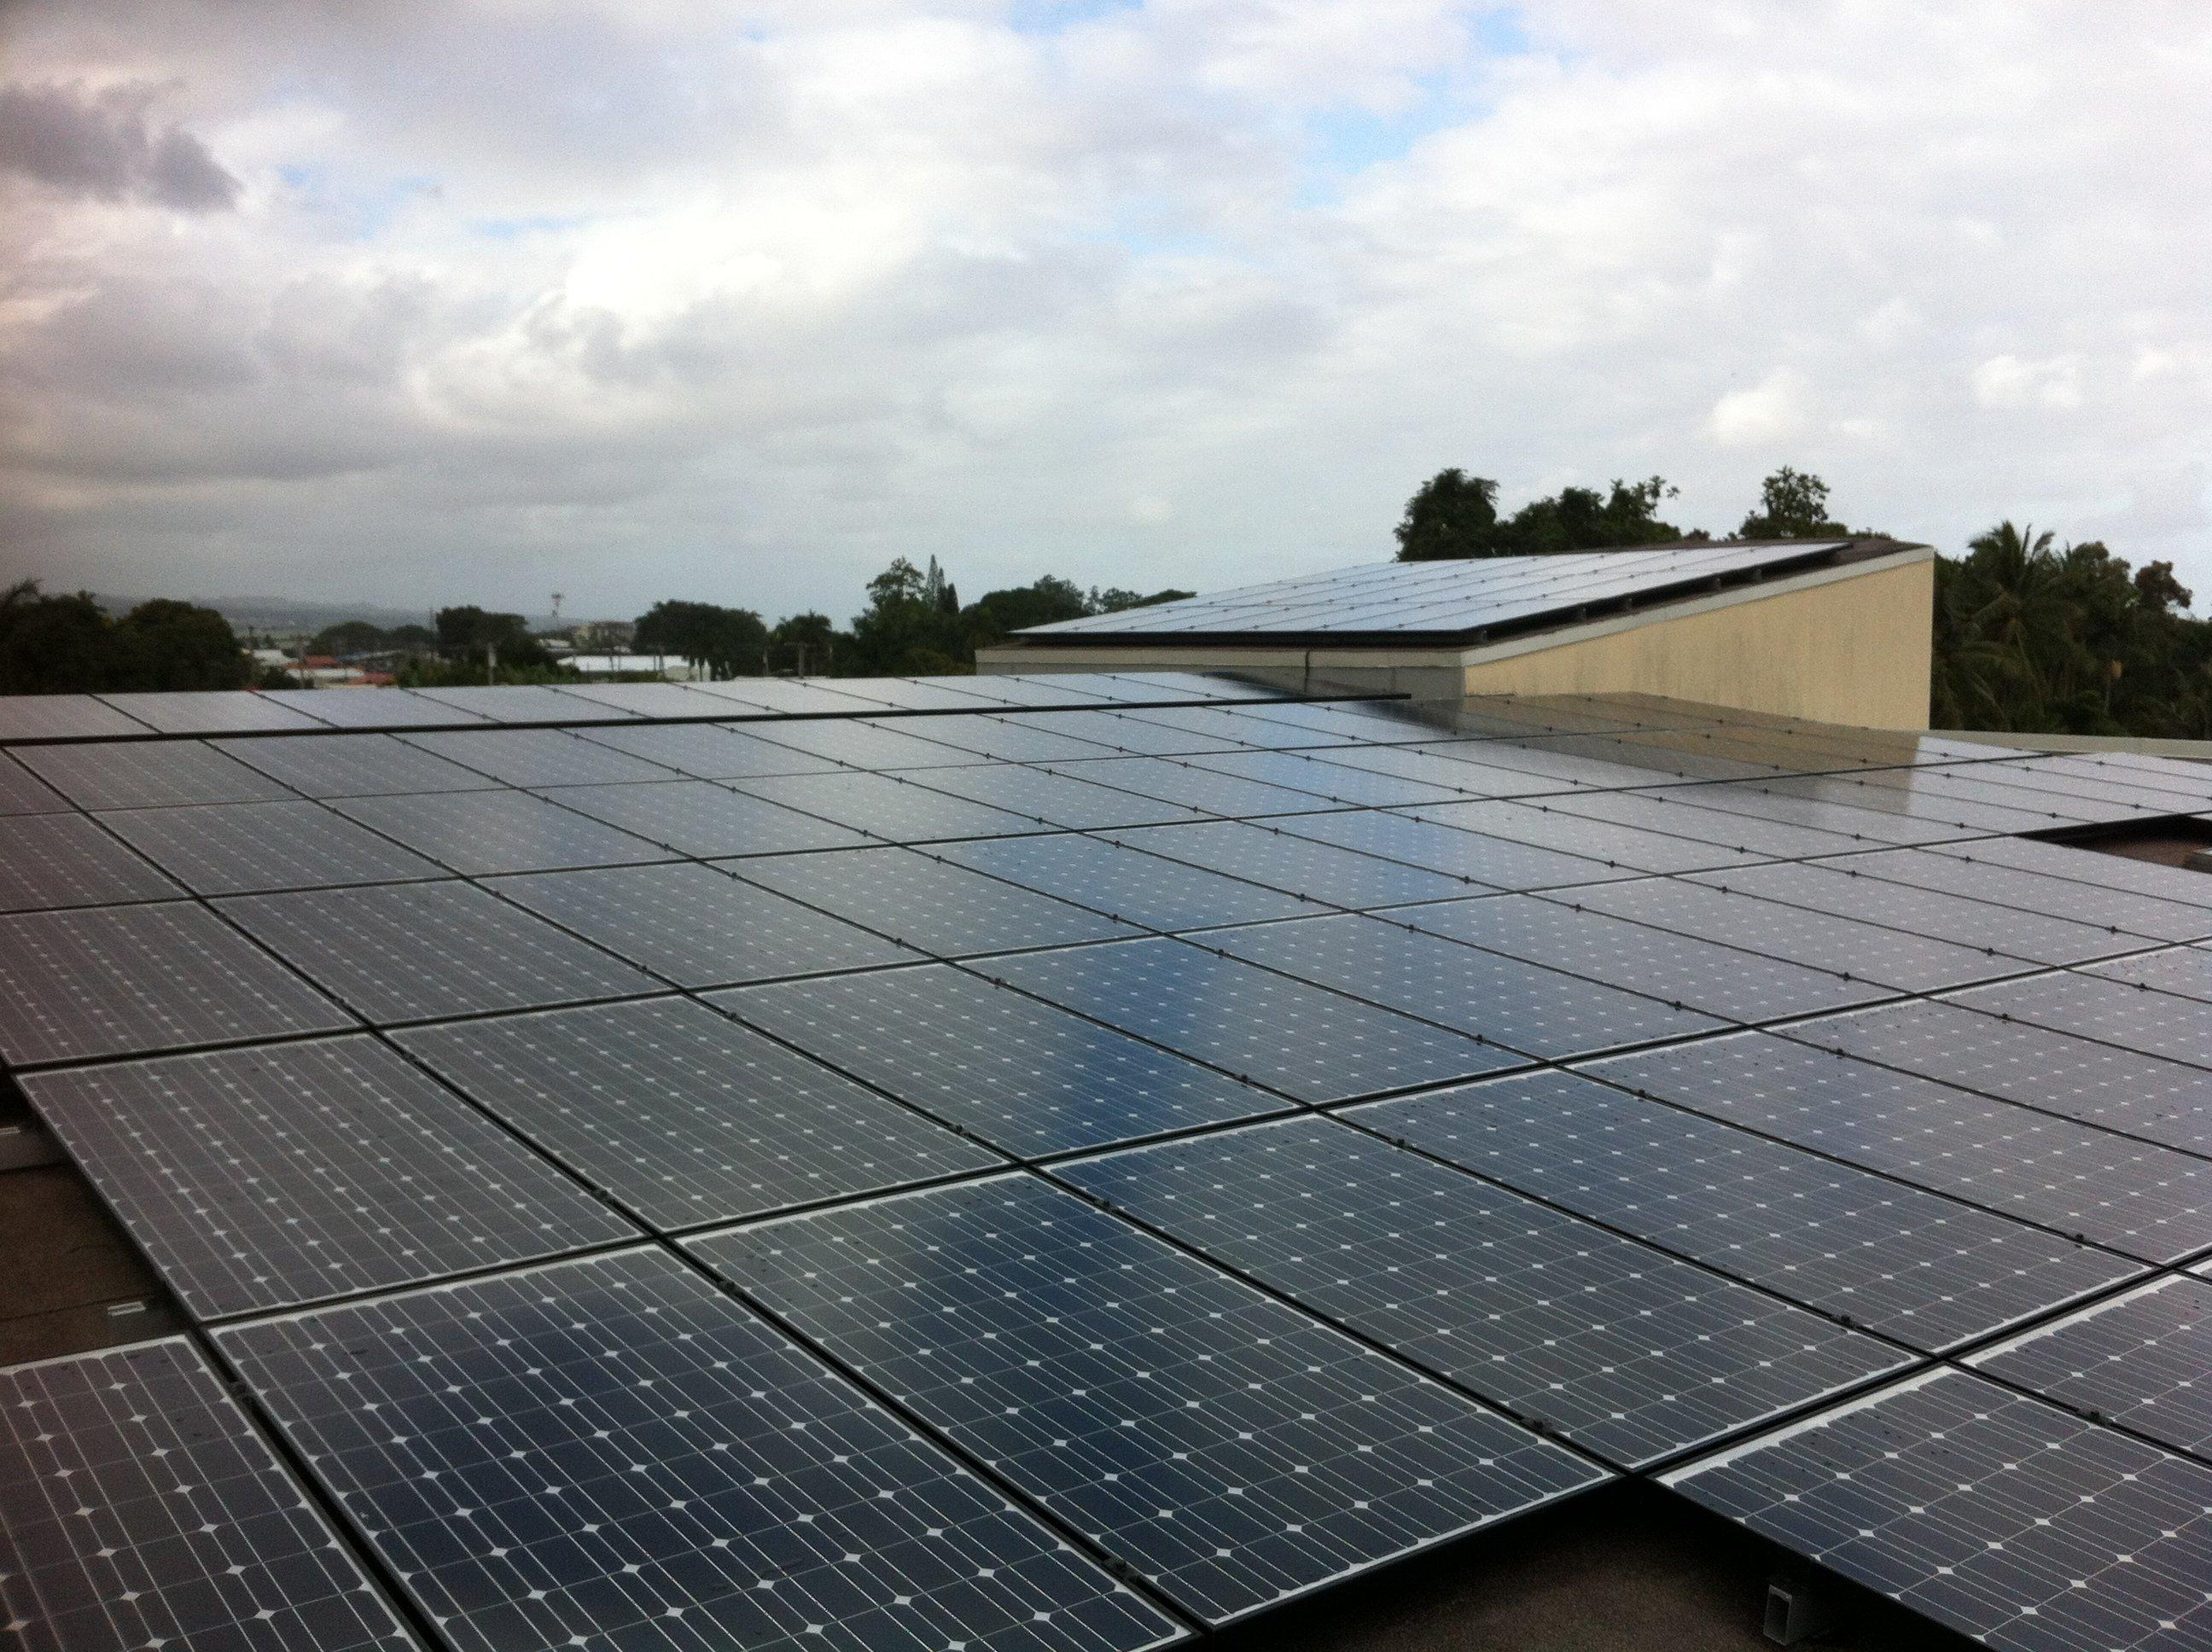 Kawili Dental group installed 45.32 KW solar power system in Honokaa, HI